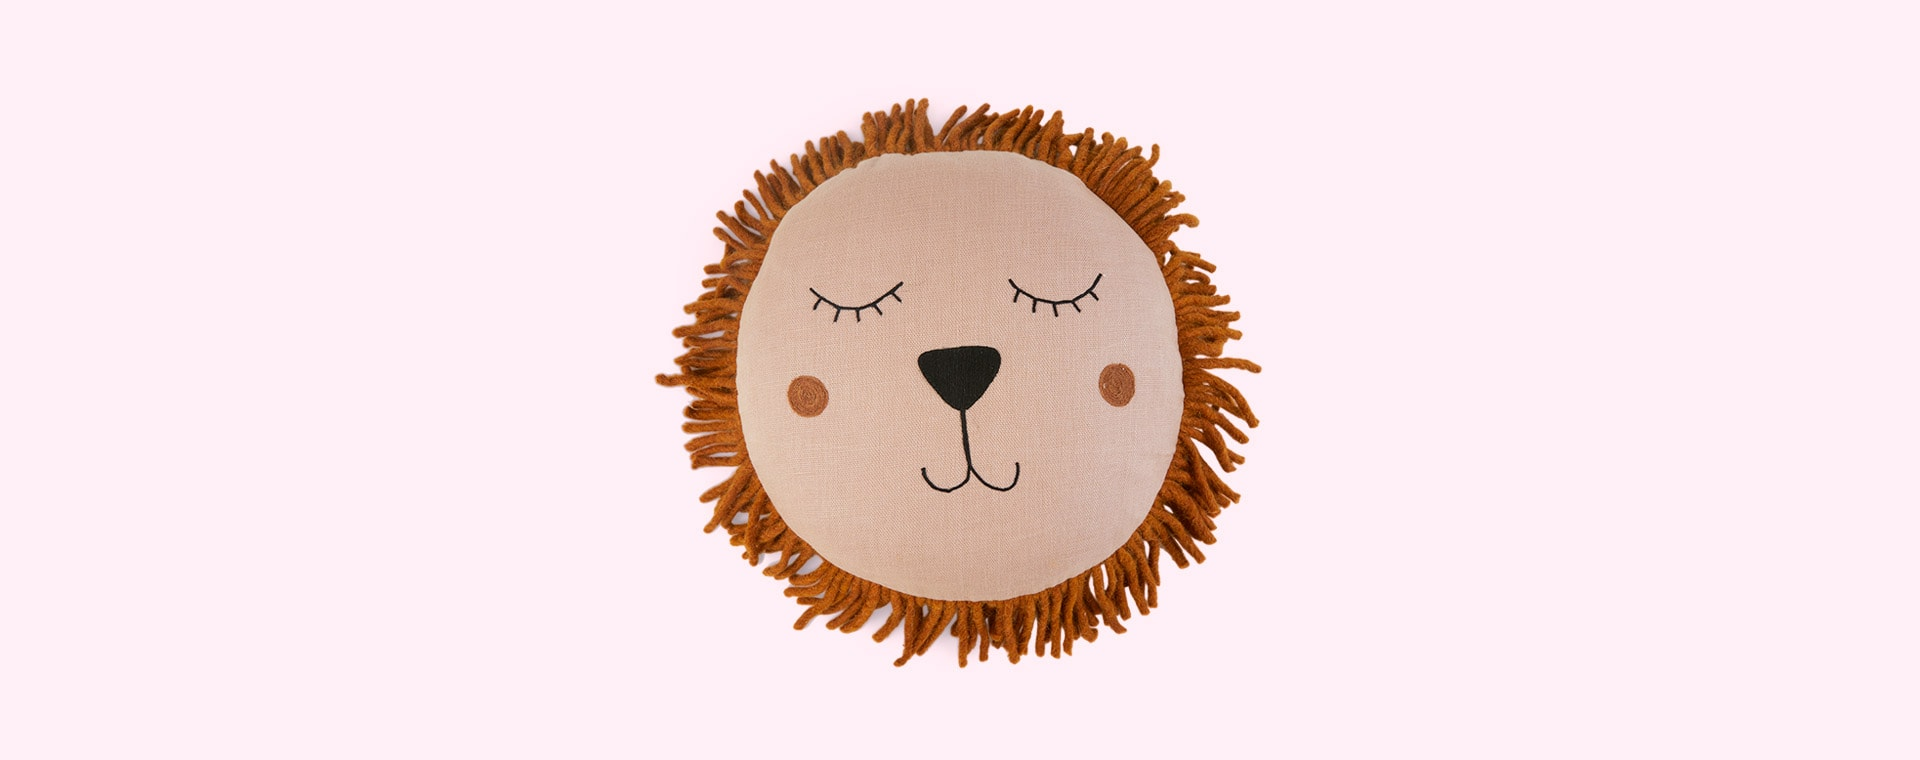 Dusty Rose Ferm Living Lion Safari Cushion